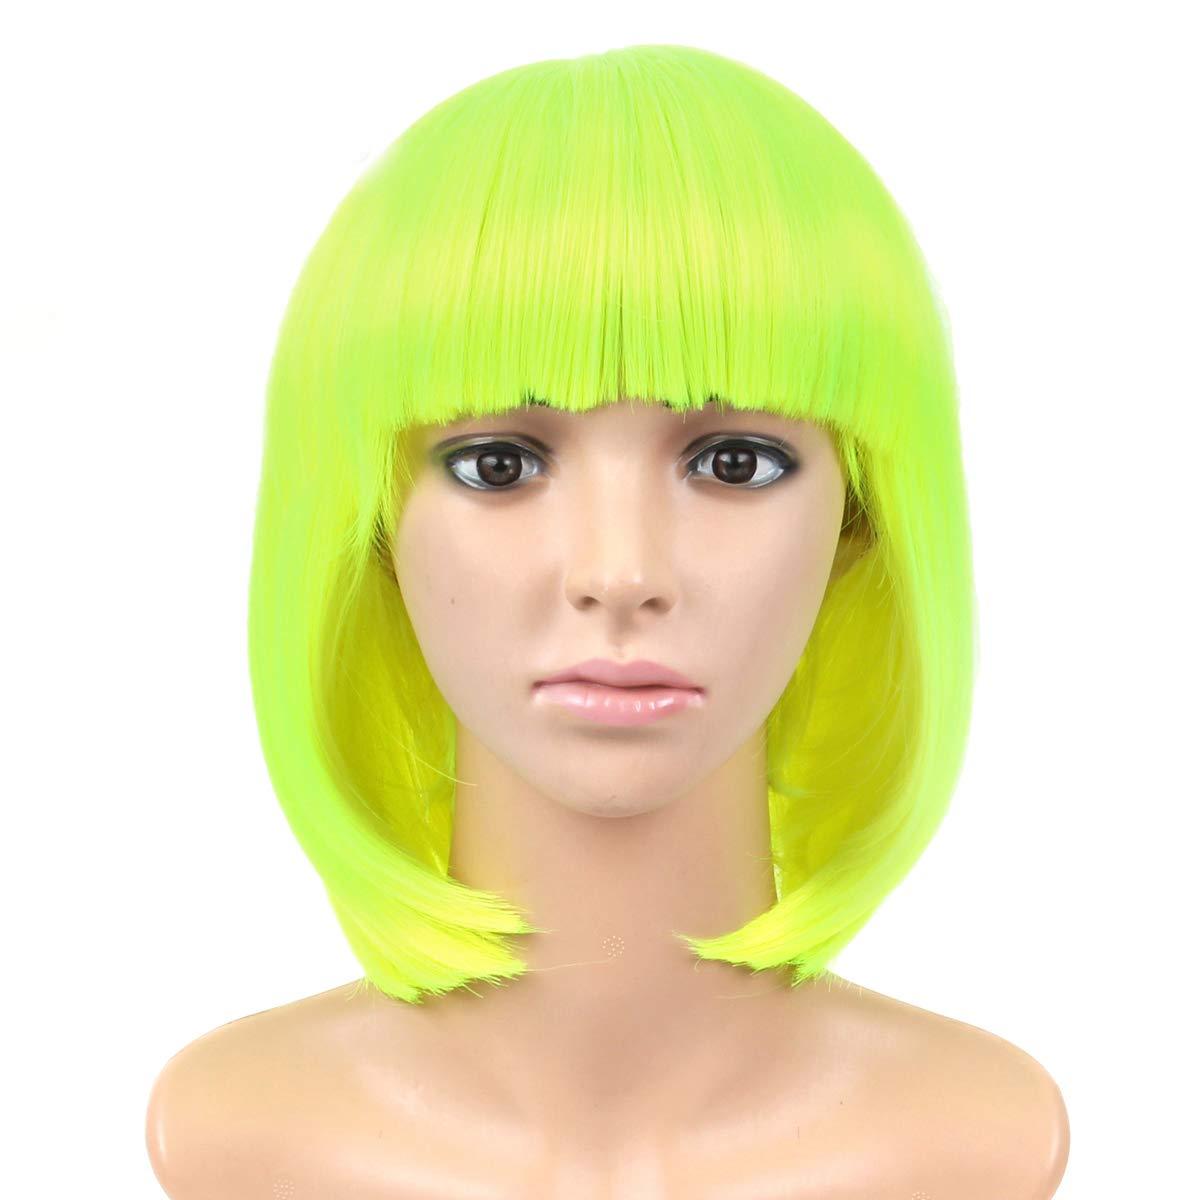 LEEONS 12 Neon Green Short Straight Bob Hair Full Wigs Cosplay Party Anime Kanekalon Synthetic Fiber Natural Looking Wigs